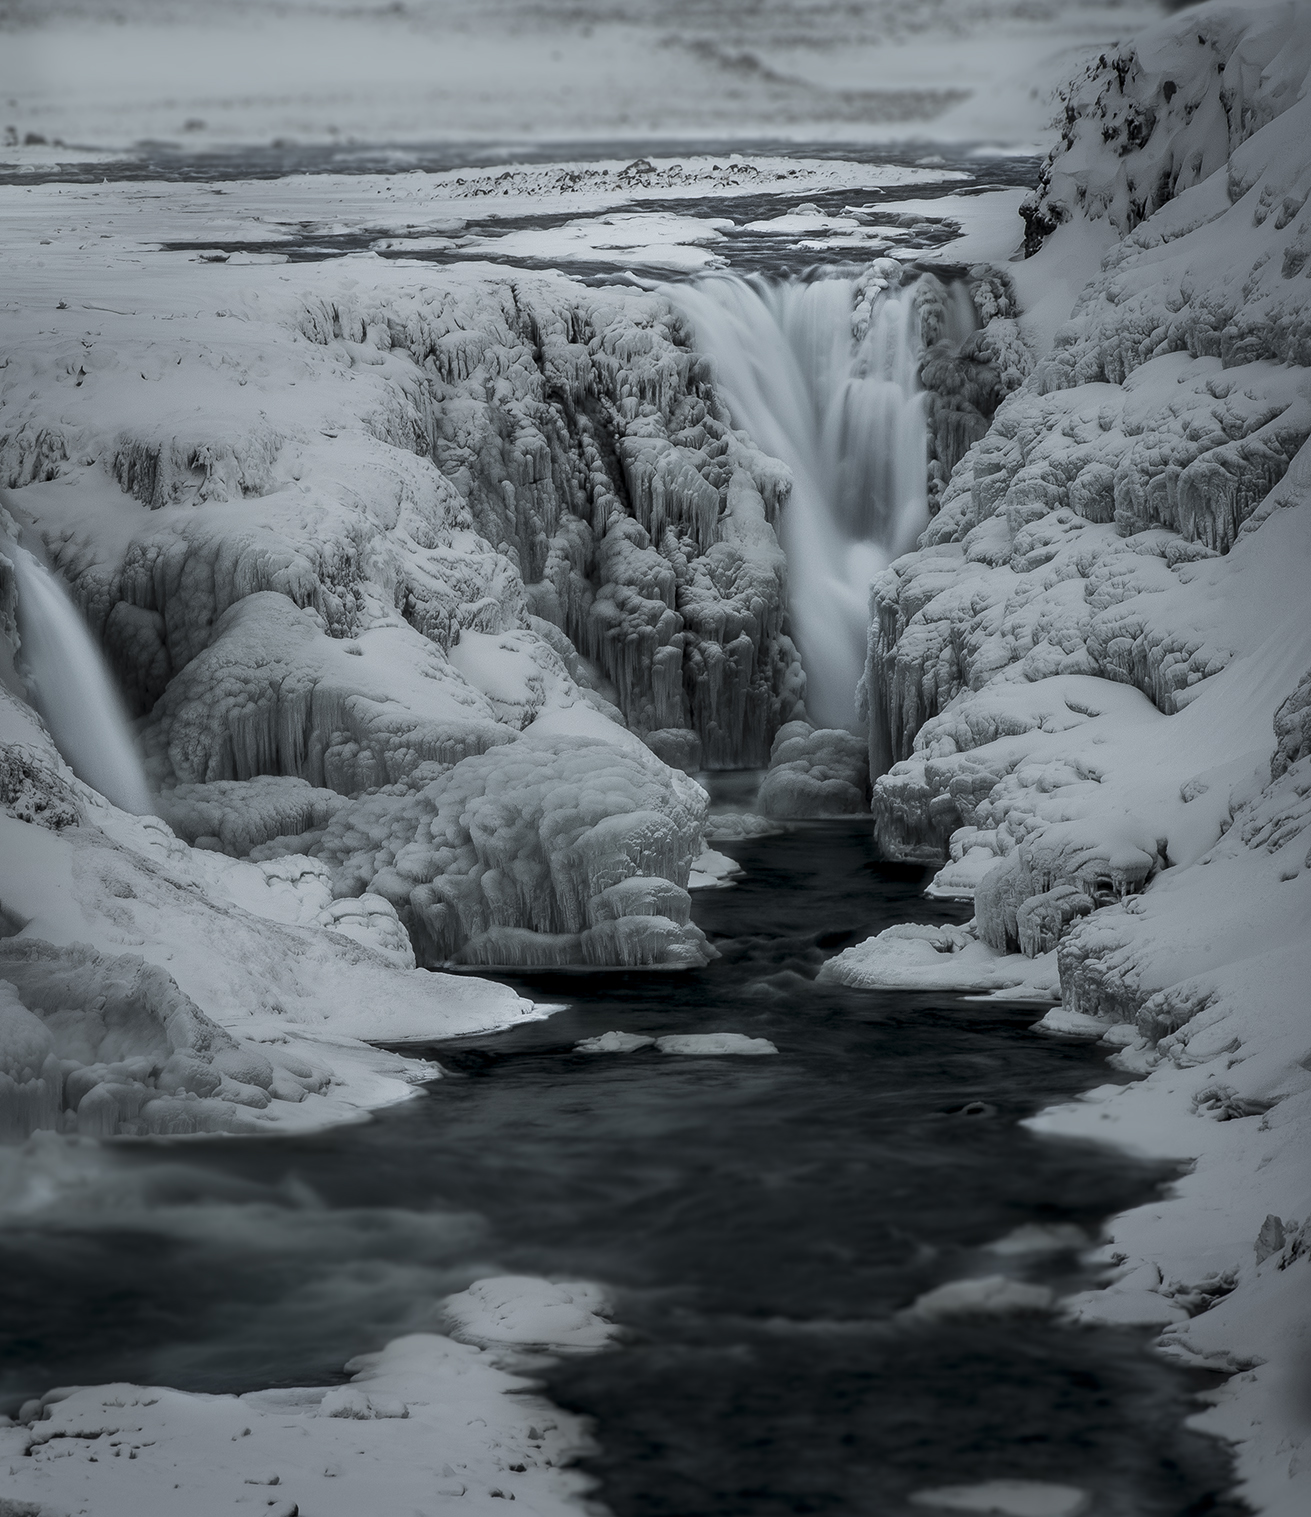 Trai_Anfield_Enlightened_Media_Iceland_G